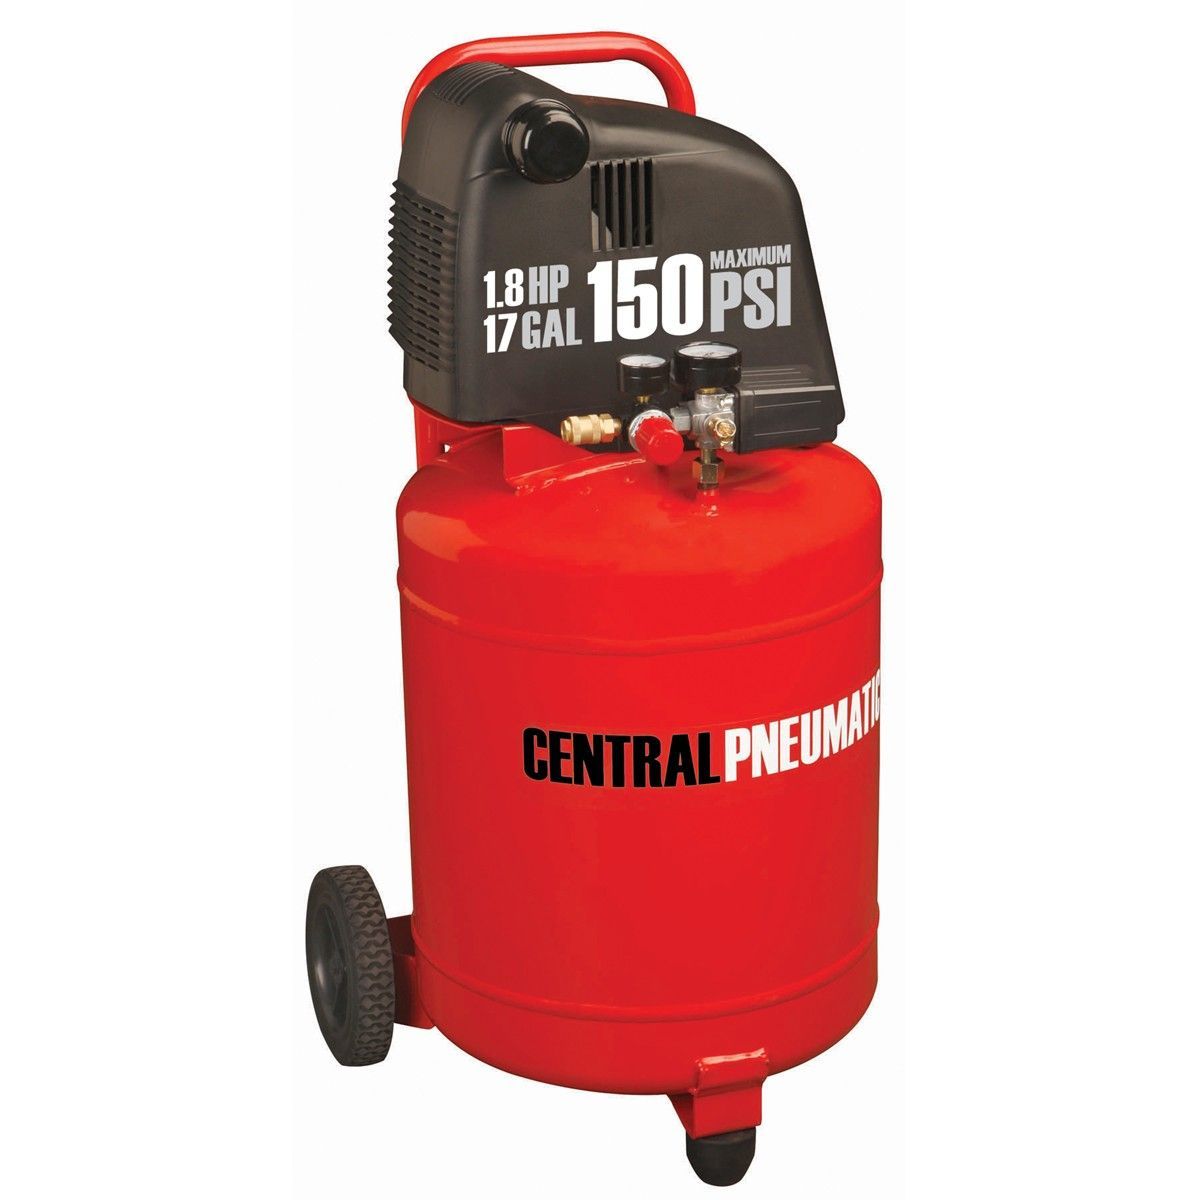 17 gal  1 8 HP 150 PSI Oil-Free Air Compressor | Tools in